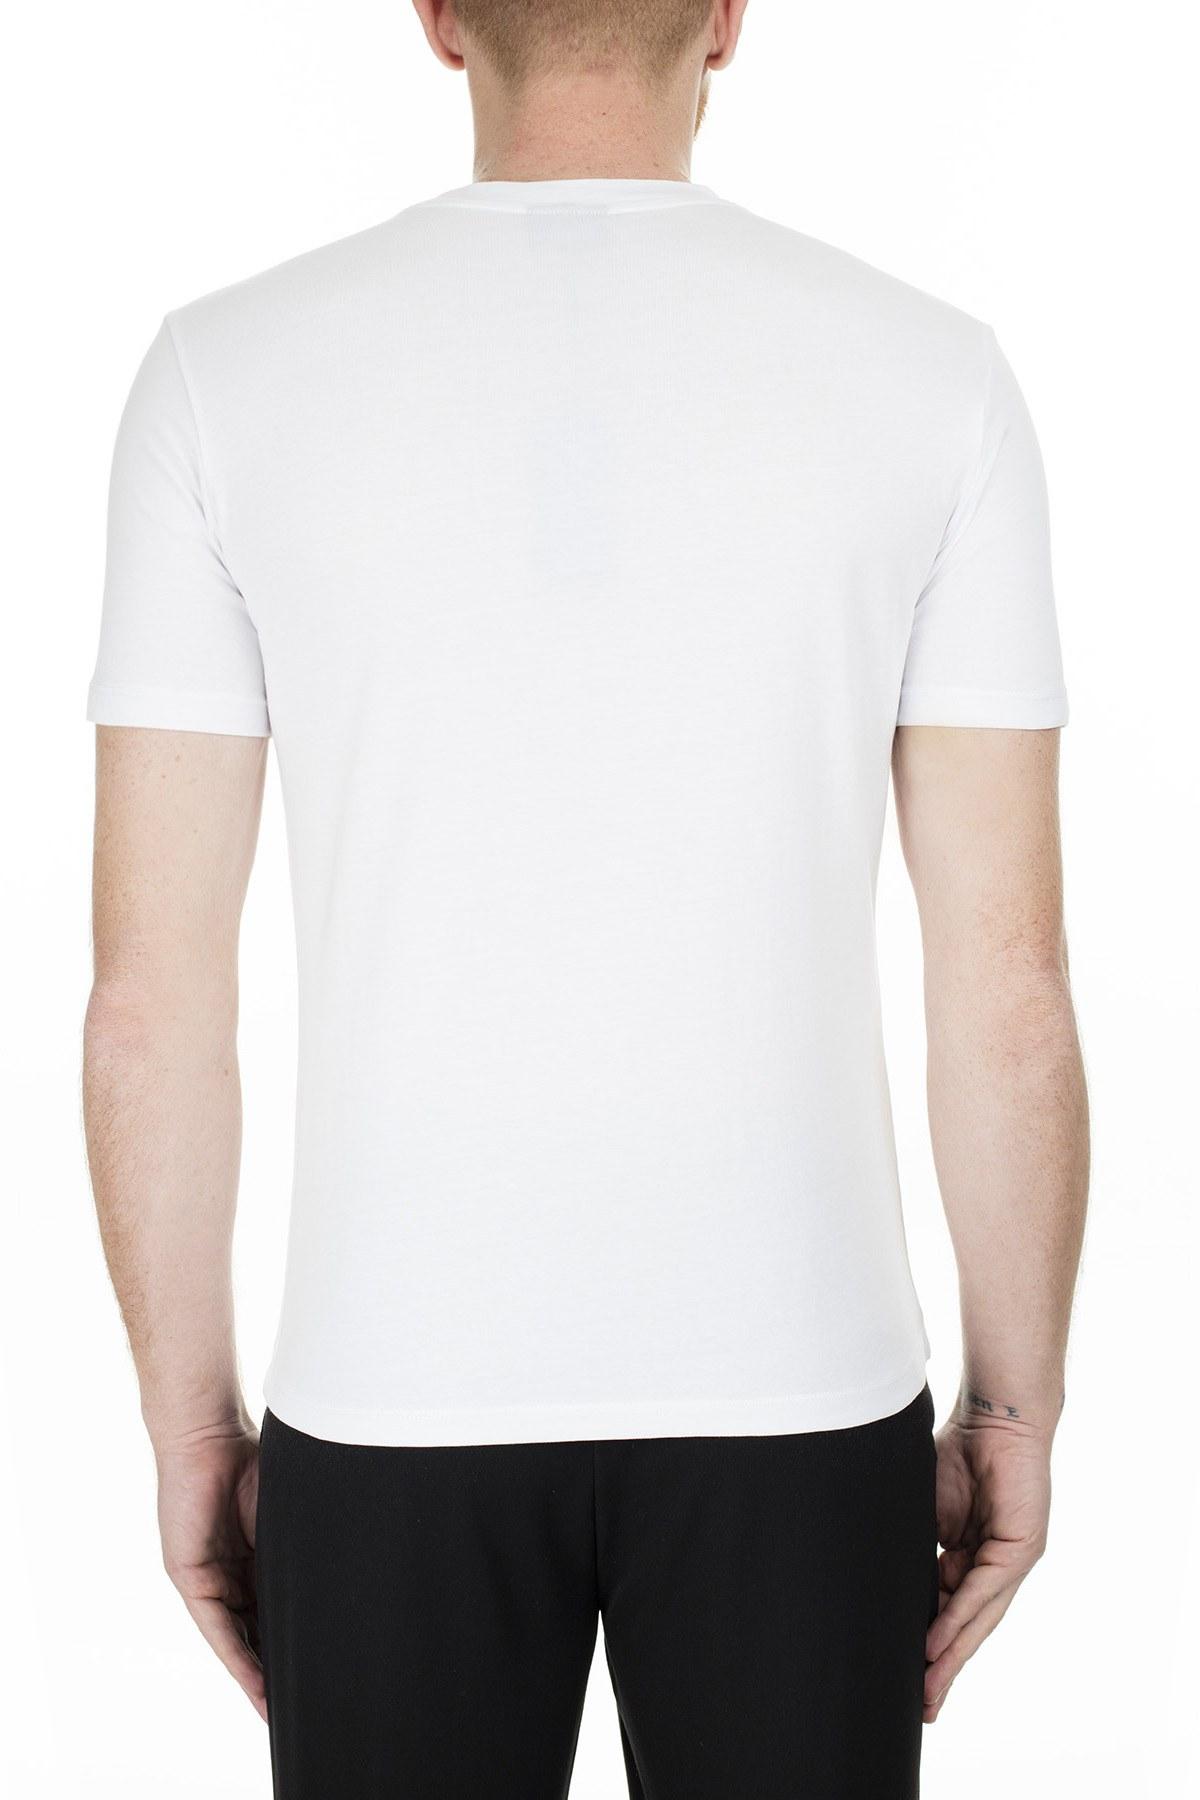 Emporio Armani Erkek T Shirt 6G1TC4 1J00Z 0100 BEYAZ